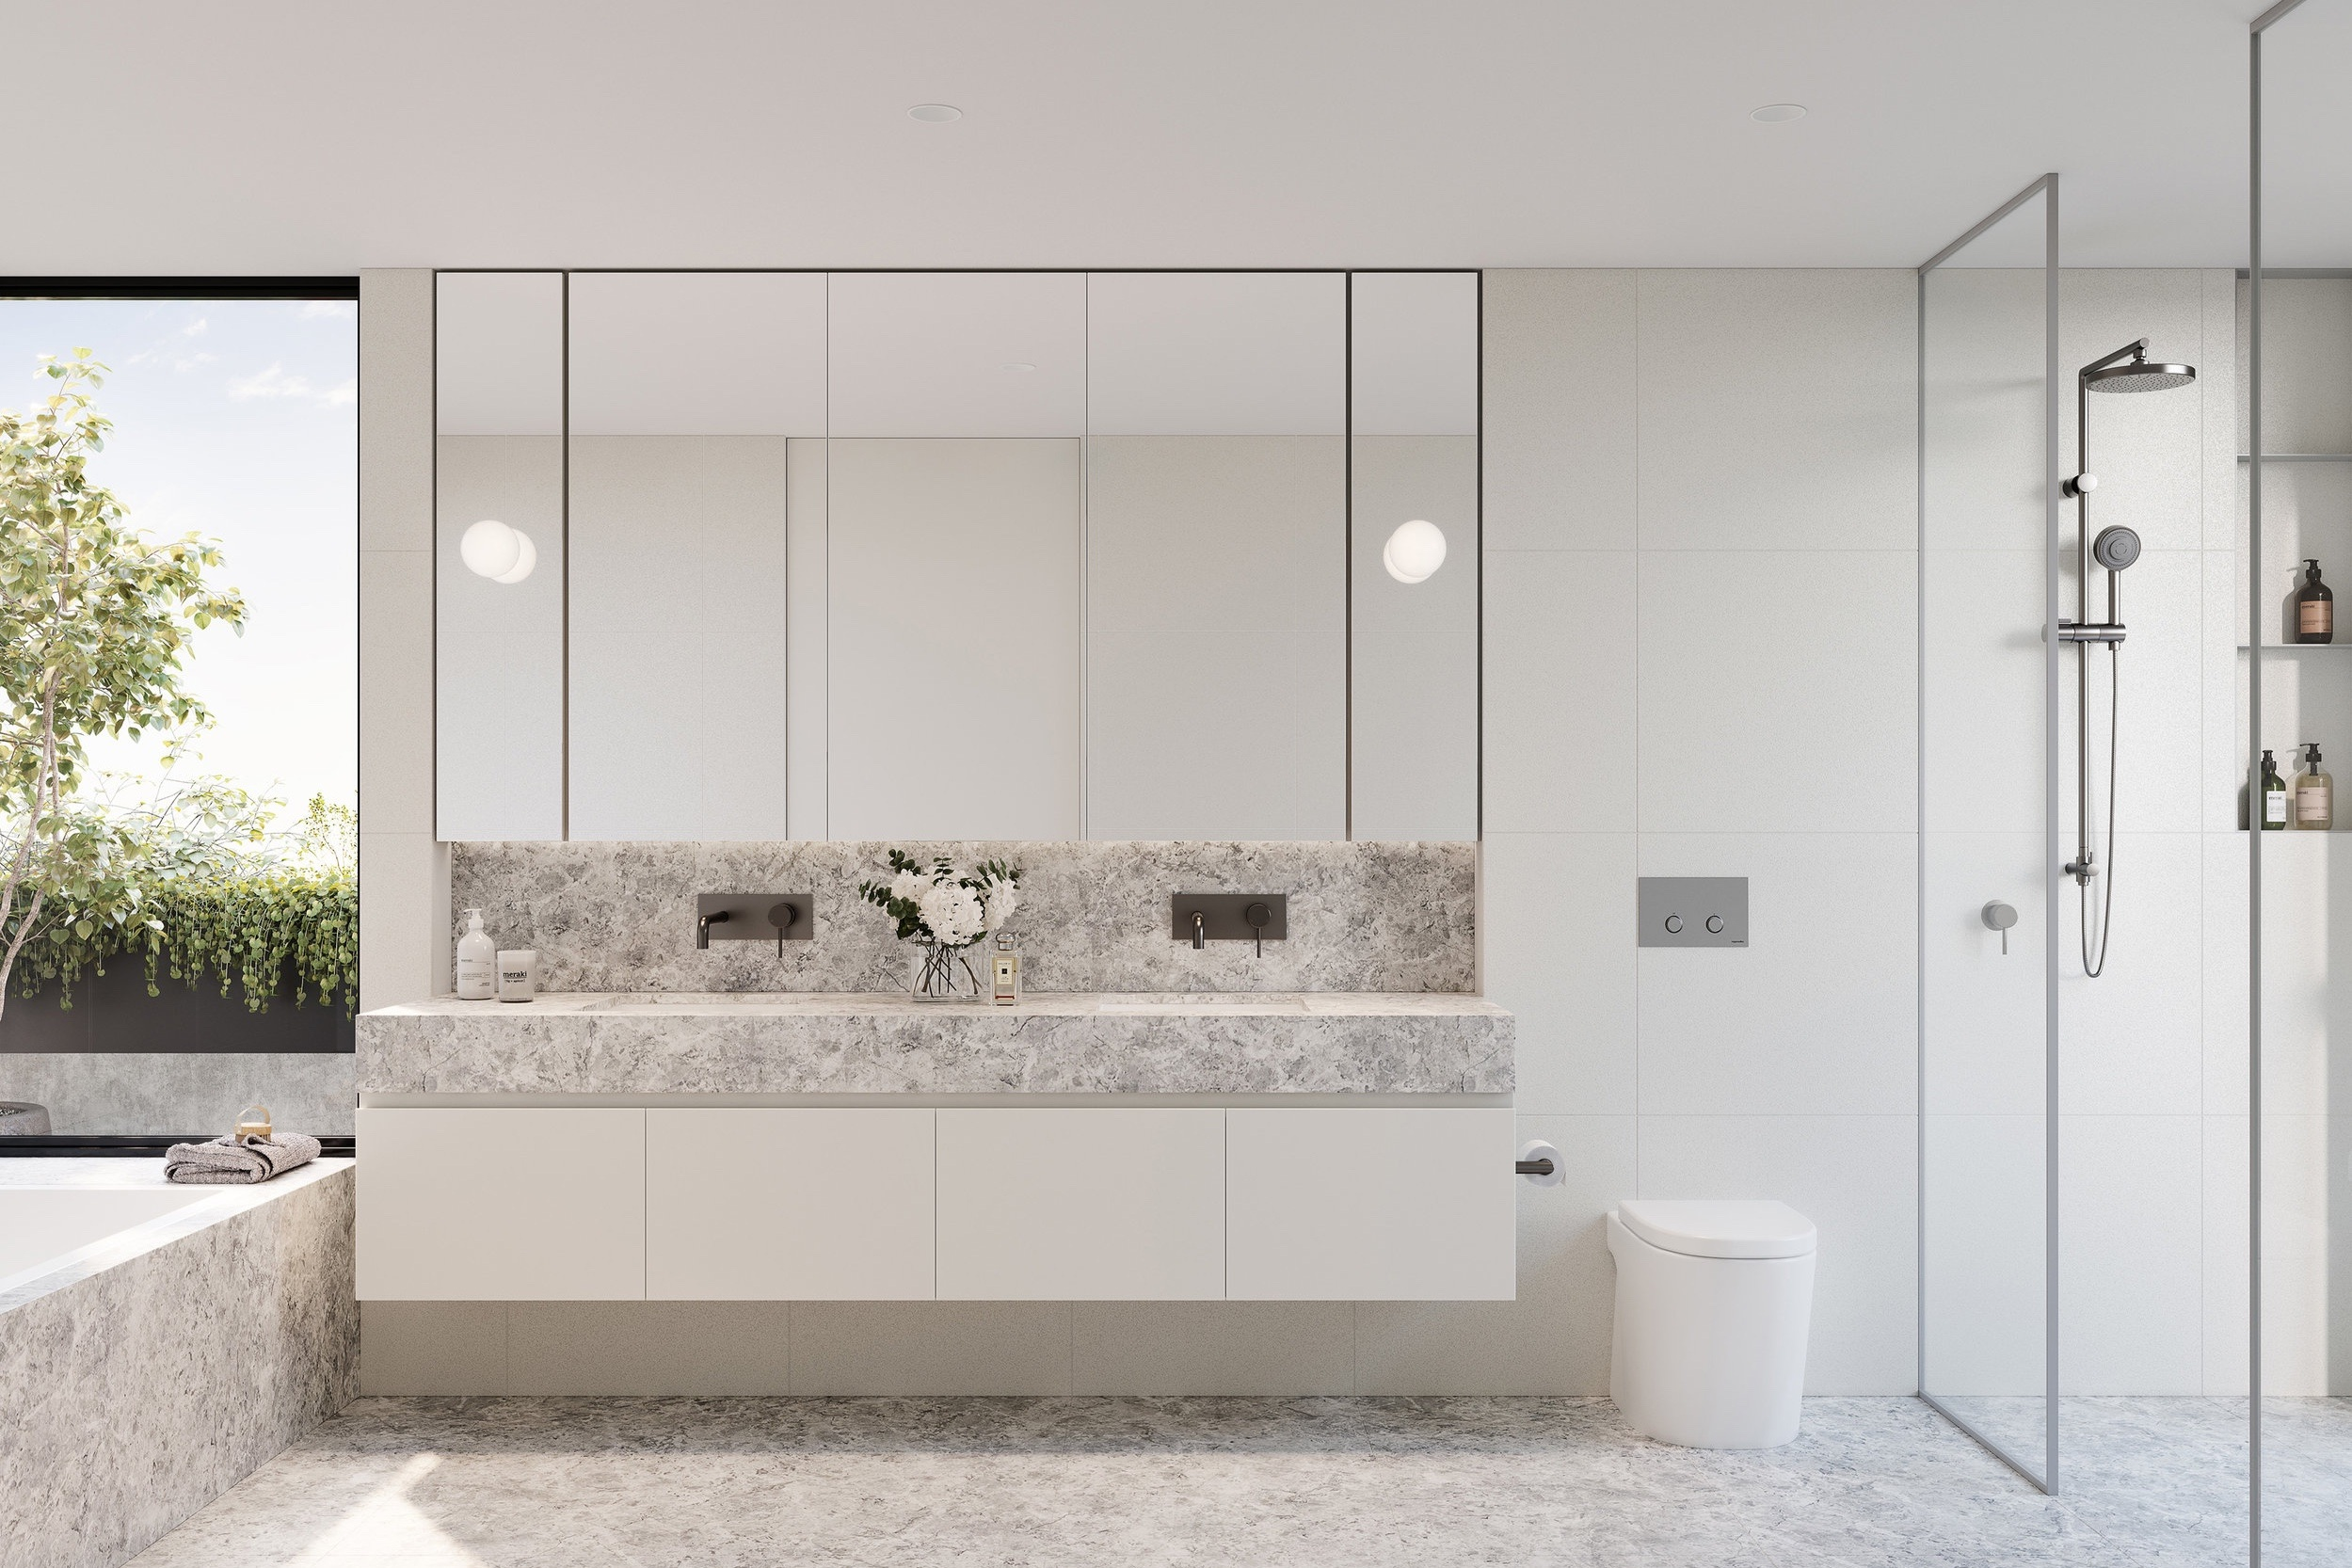 INT04_Bathroom LR.jpg